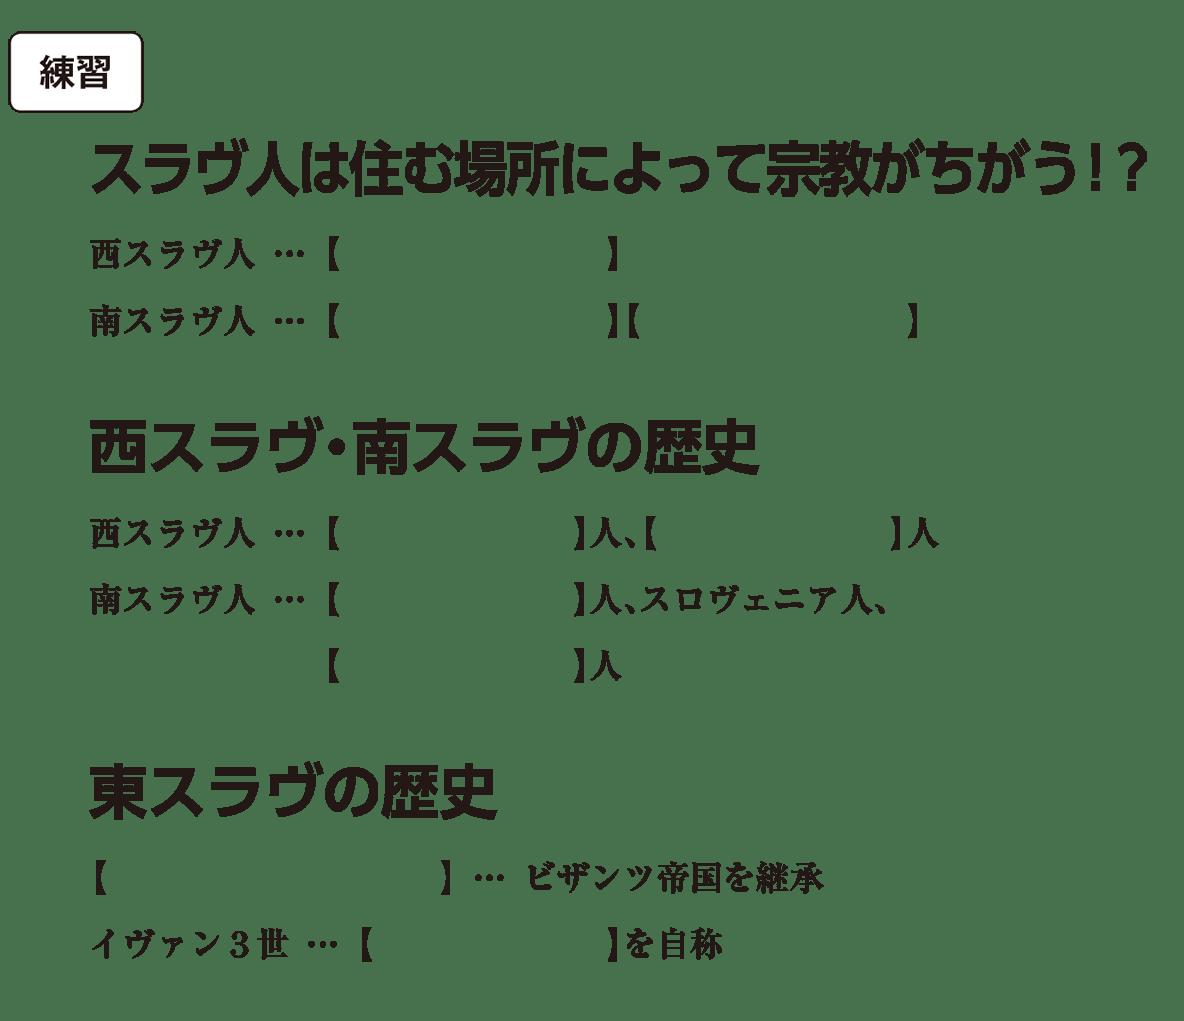 高校世界史 中世ヨーロッパ世界の各国史5 練習 括弧空欄